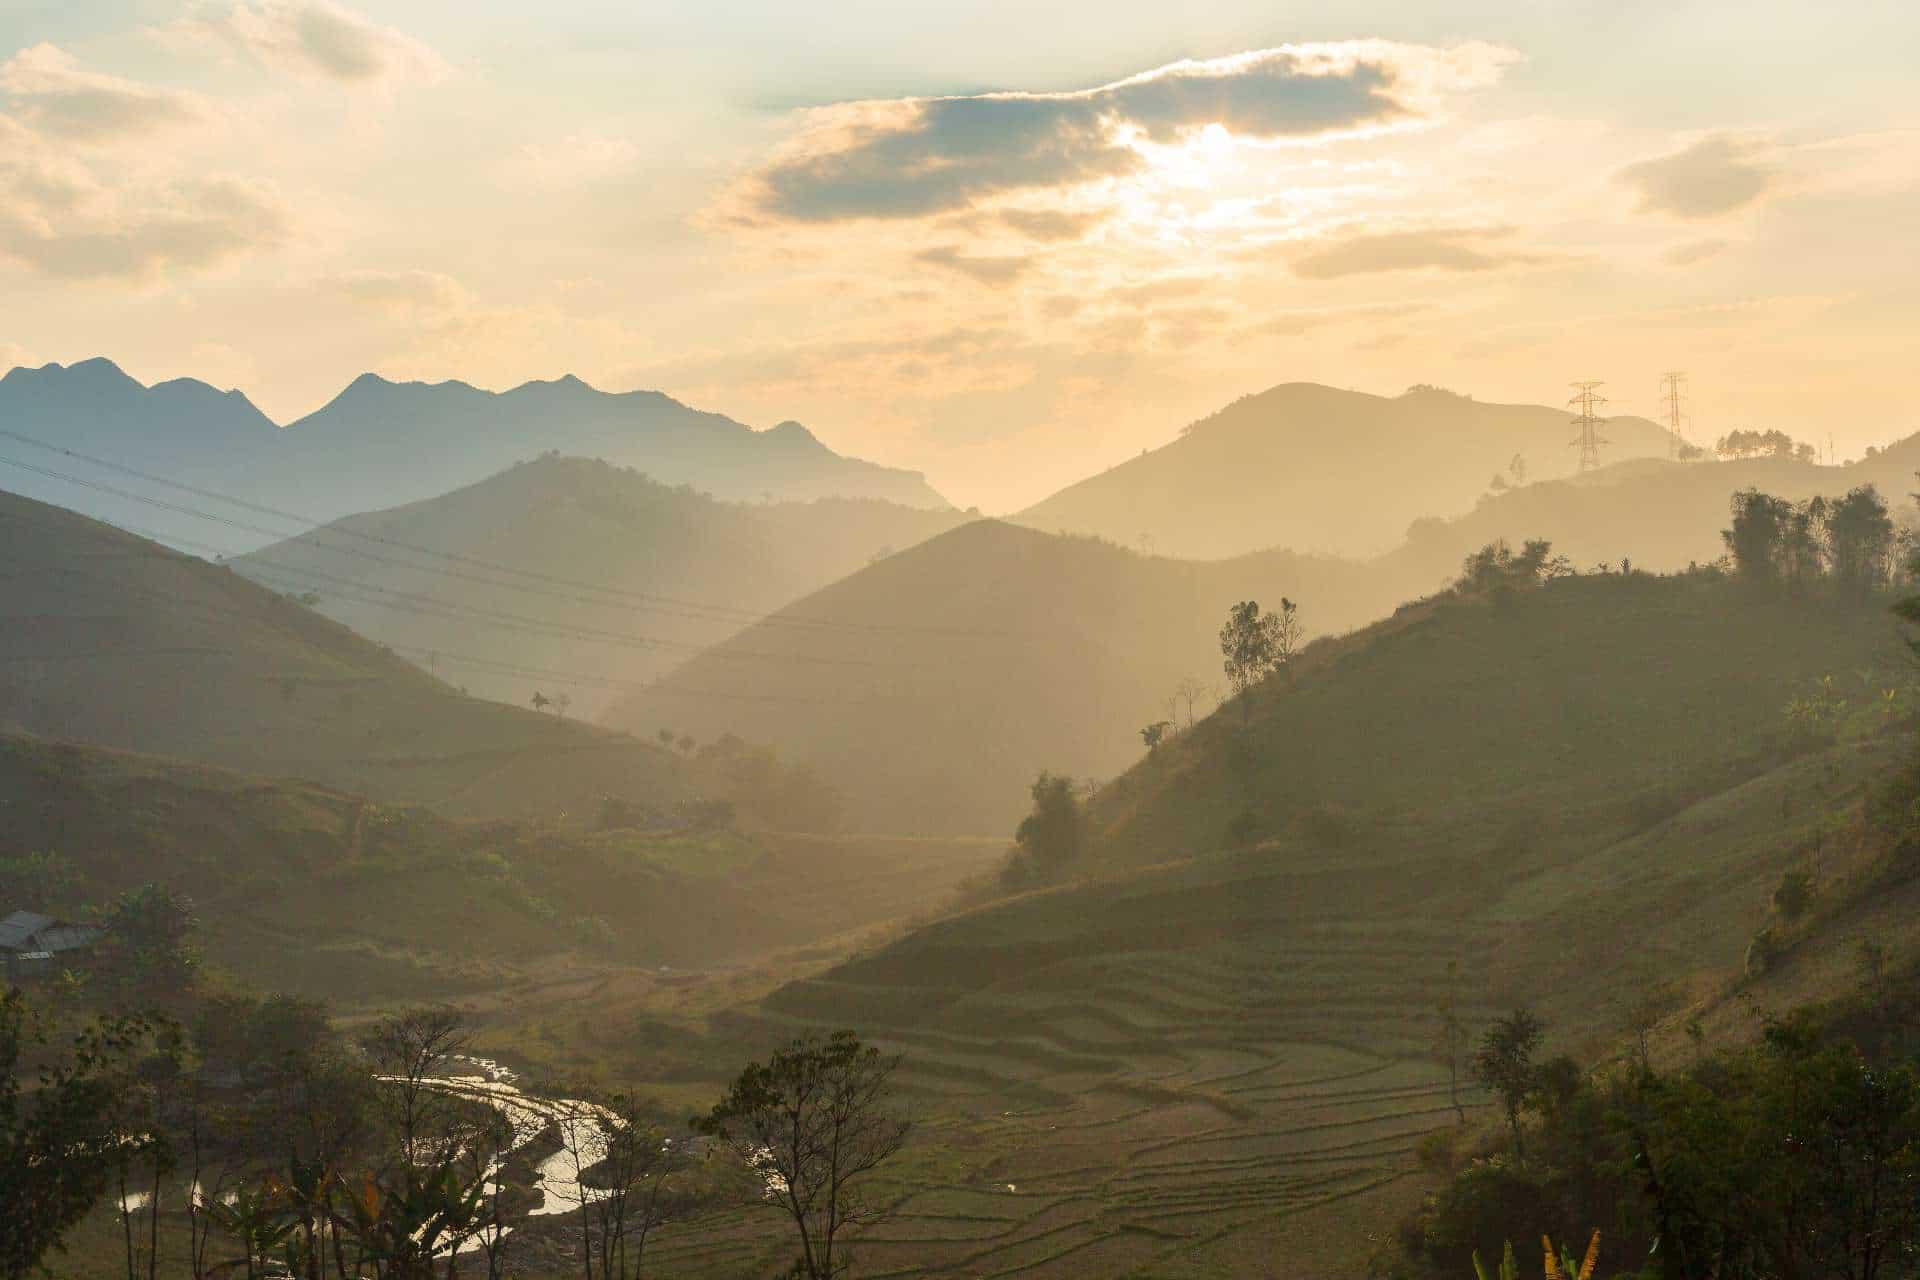 Sever Vietnam